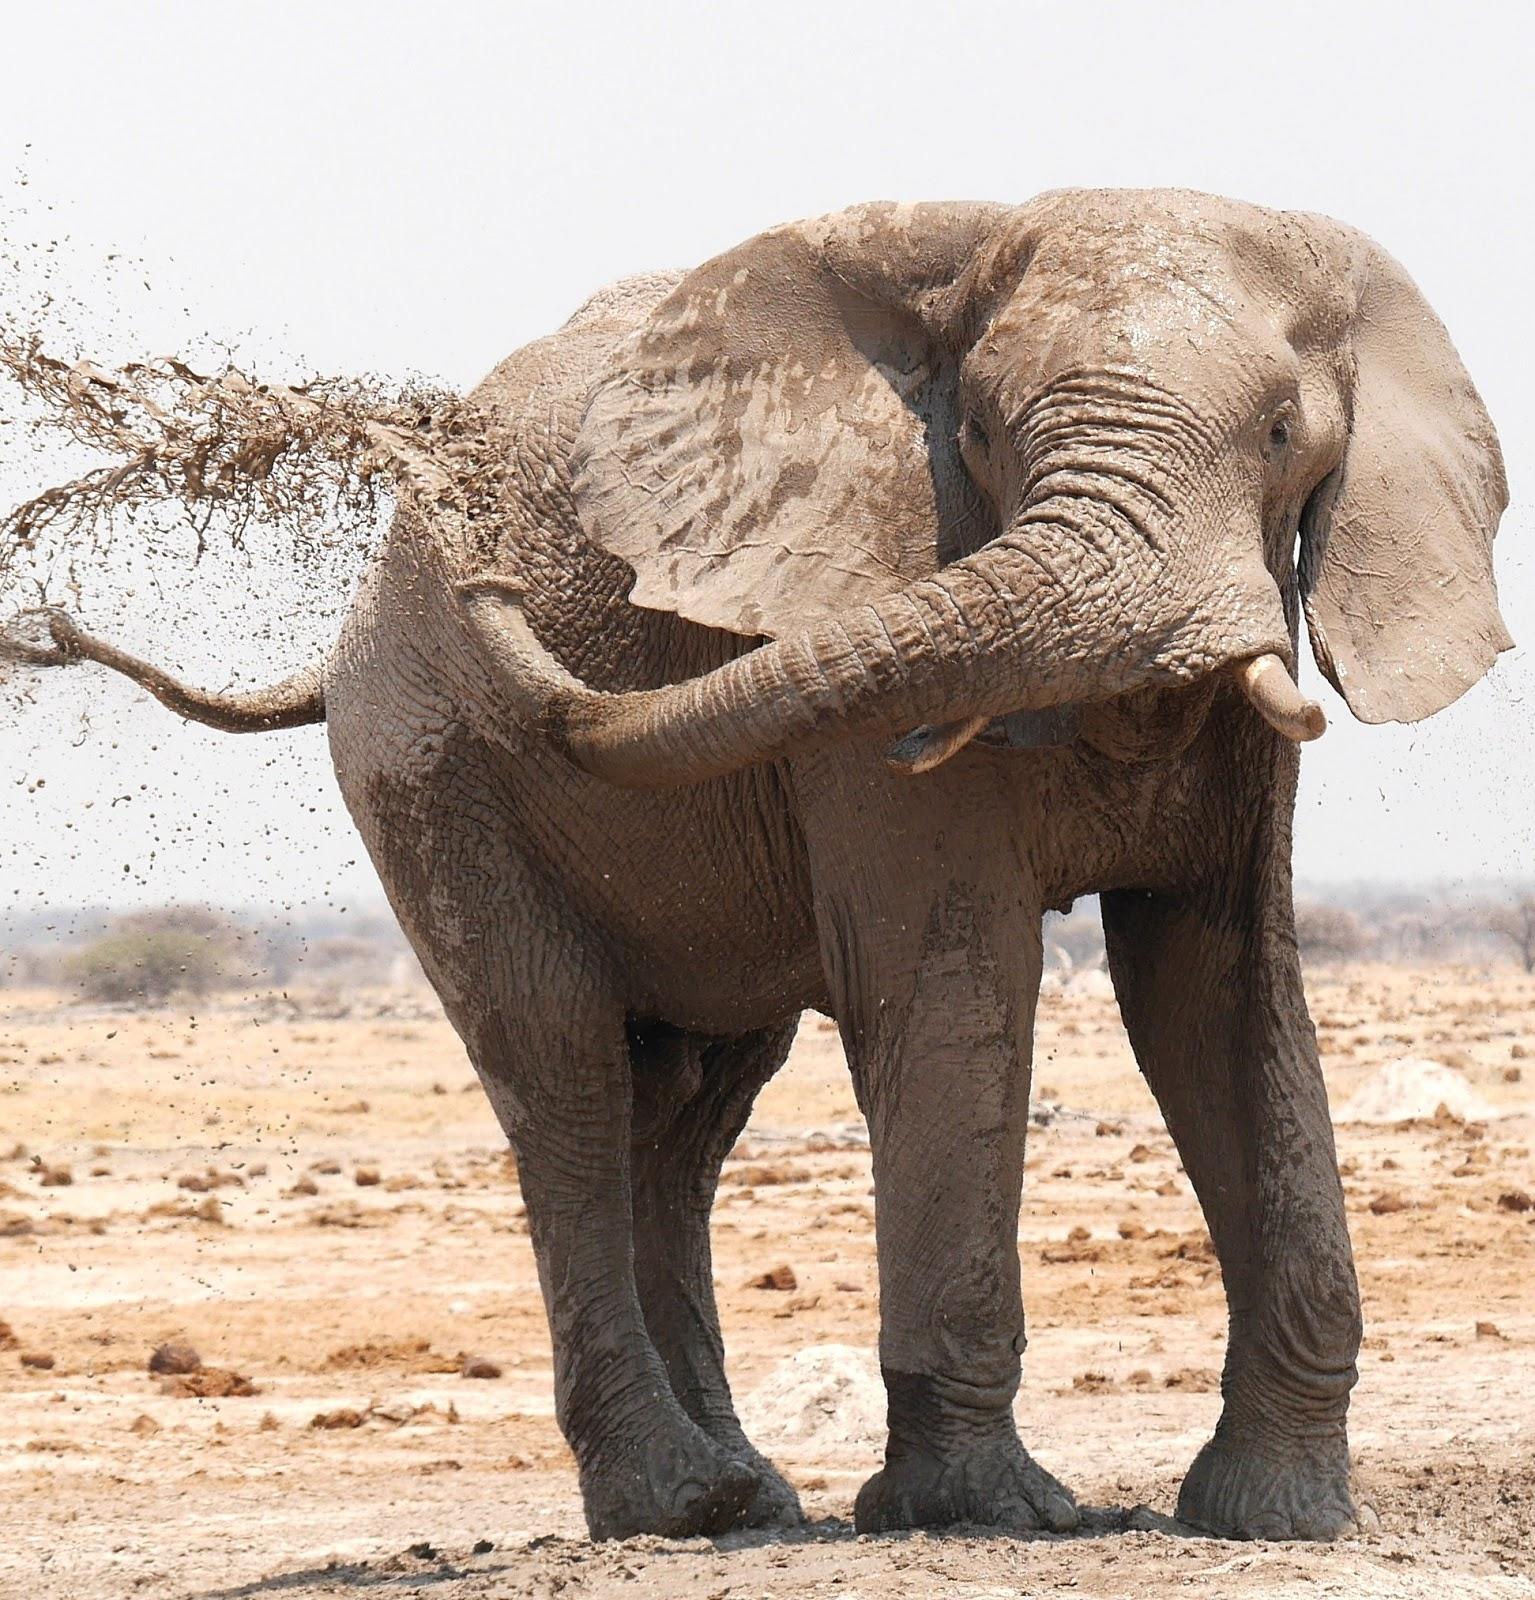 An elephant spraying mud on itself.